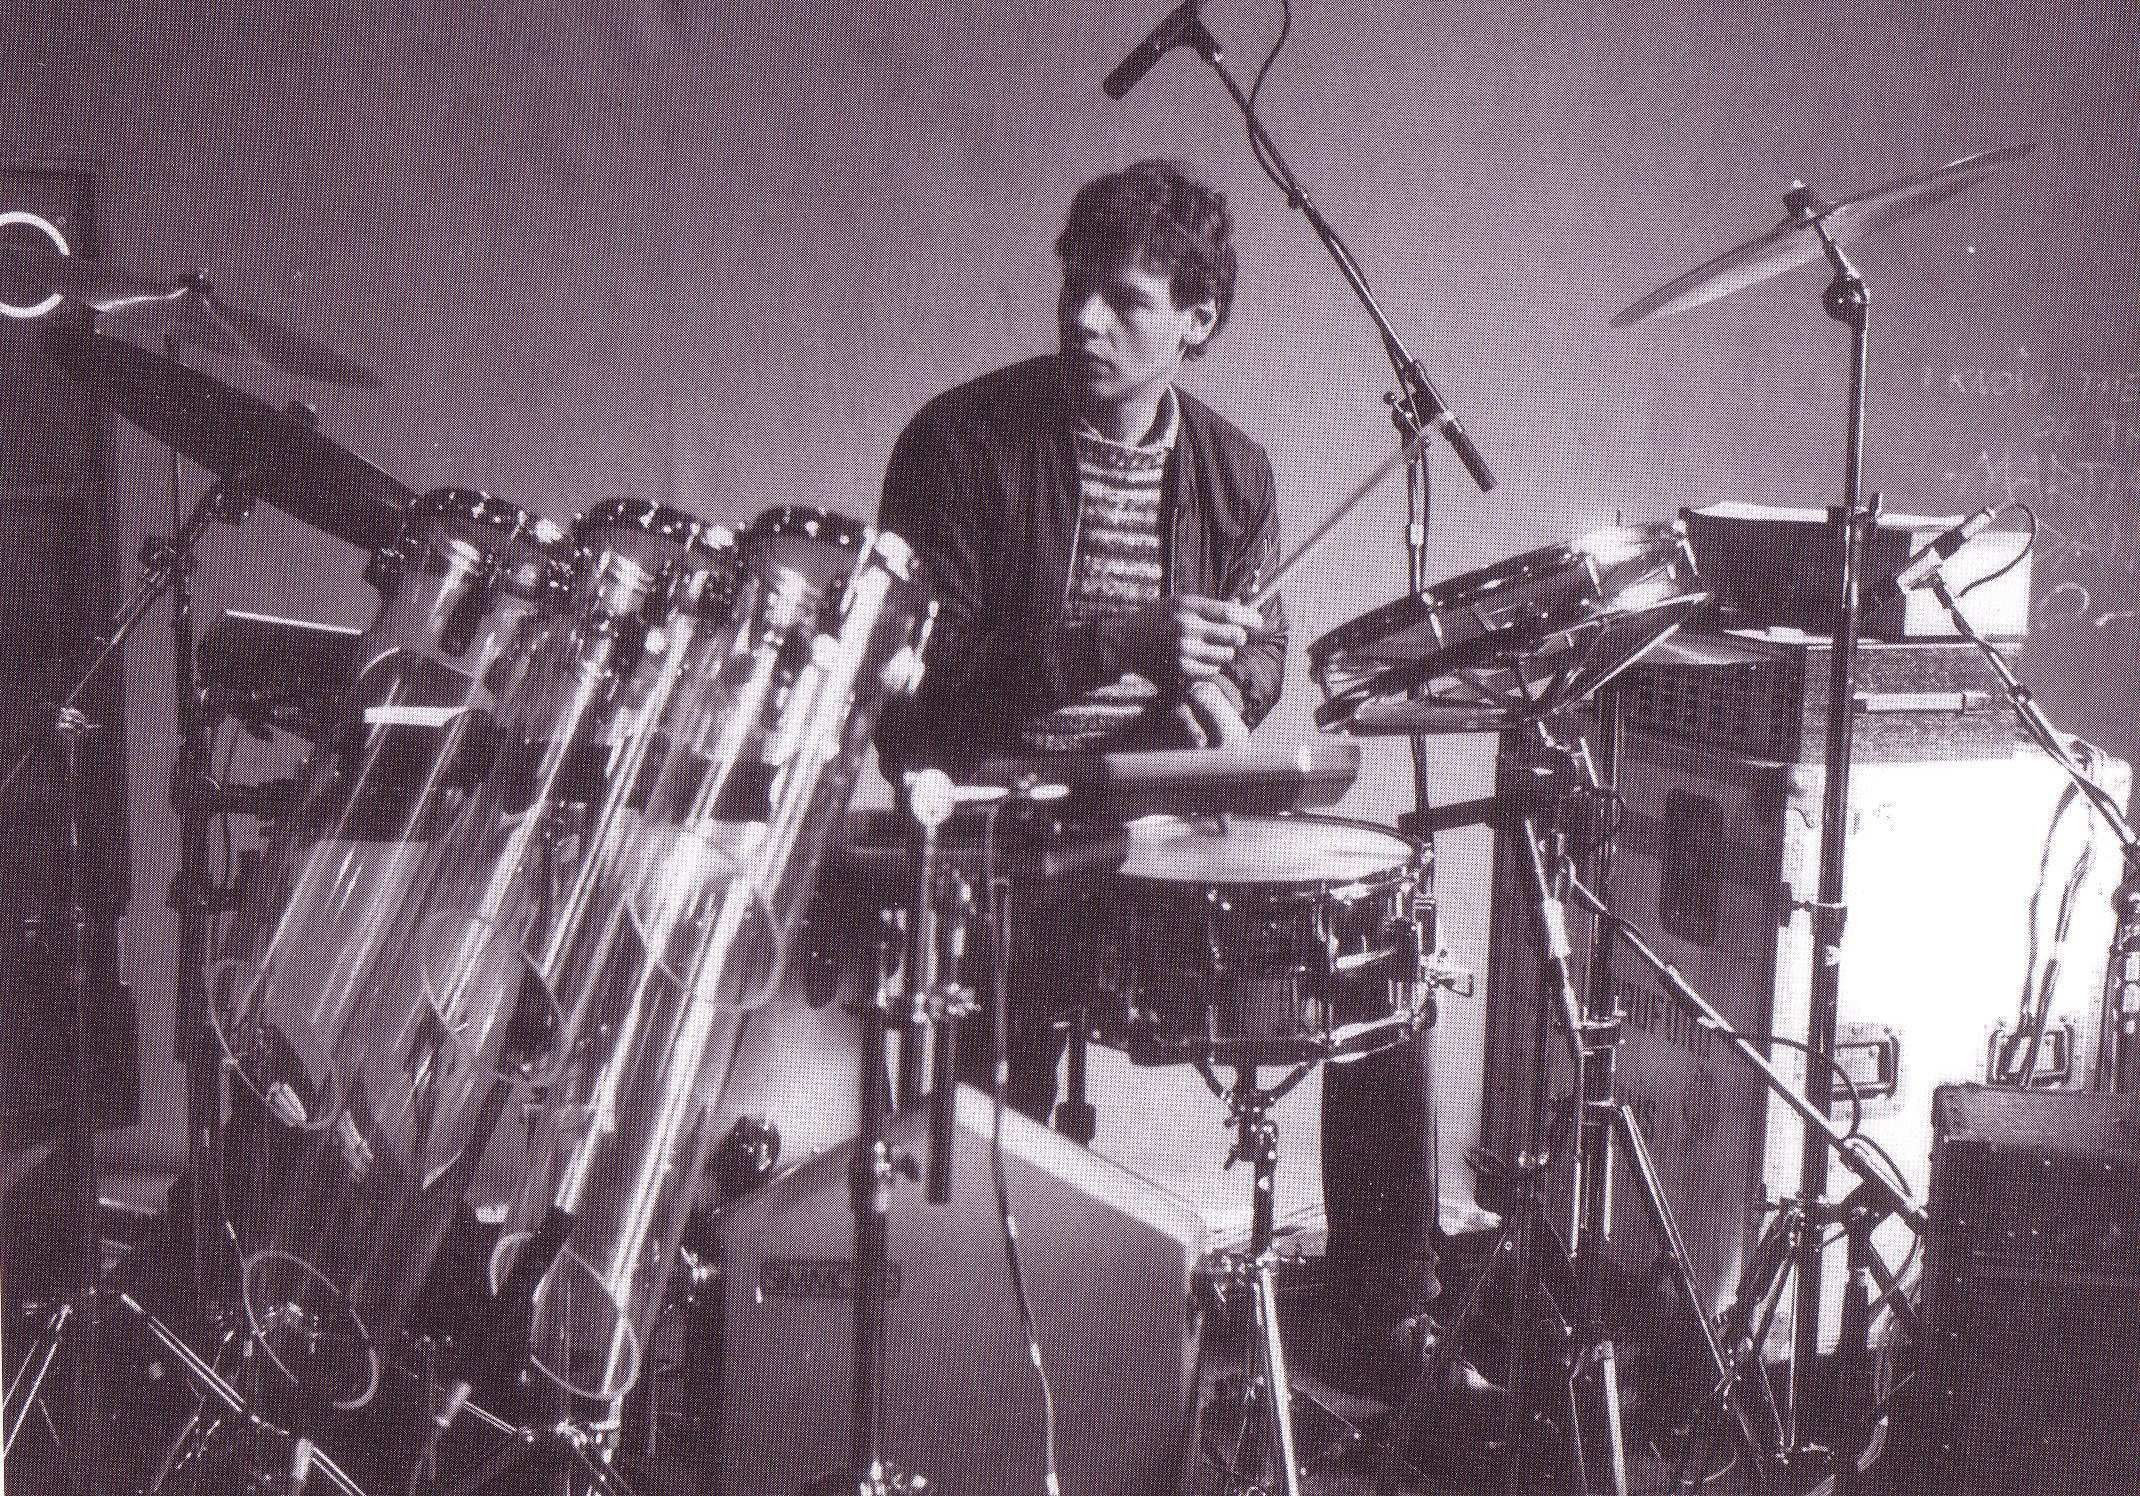 140 Great Drummers Ideas Drummer Drums Jazz Musicians